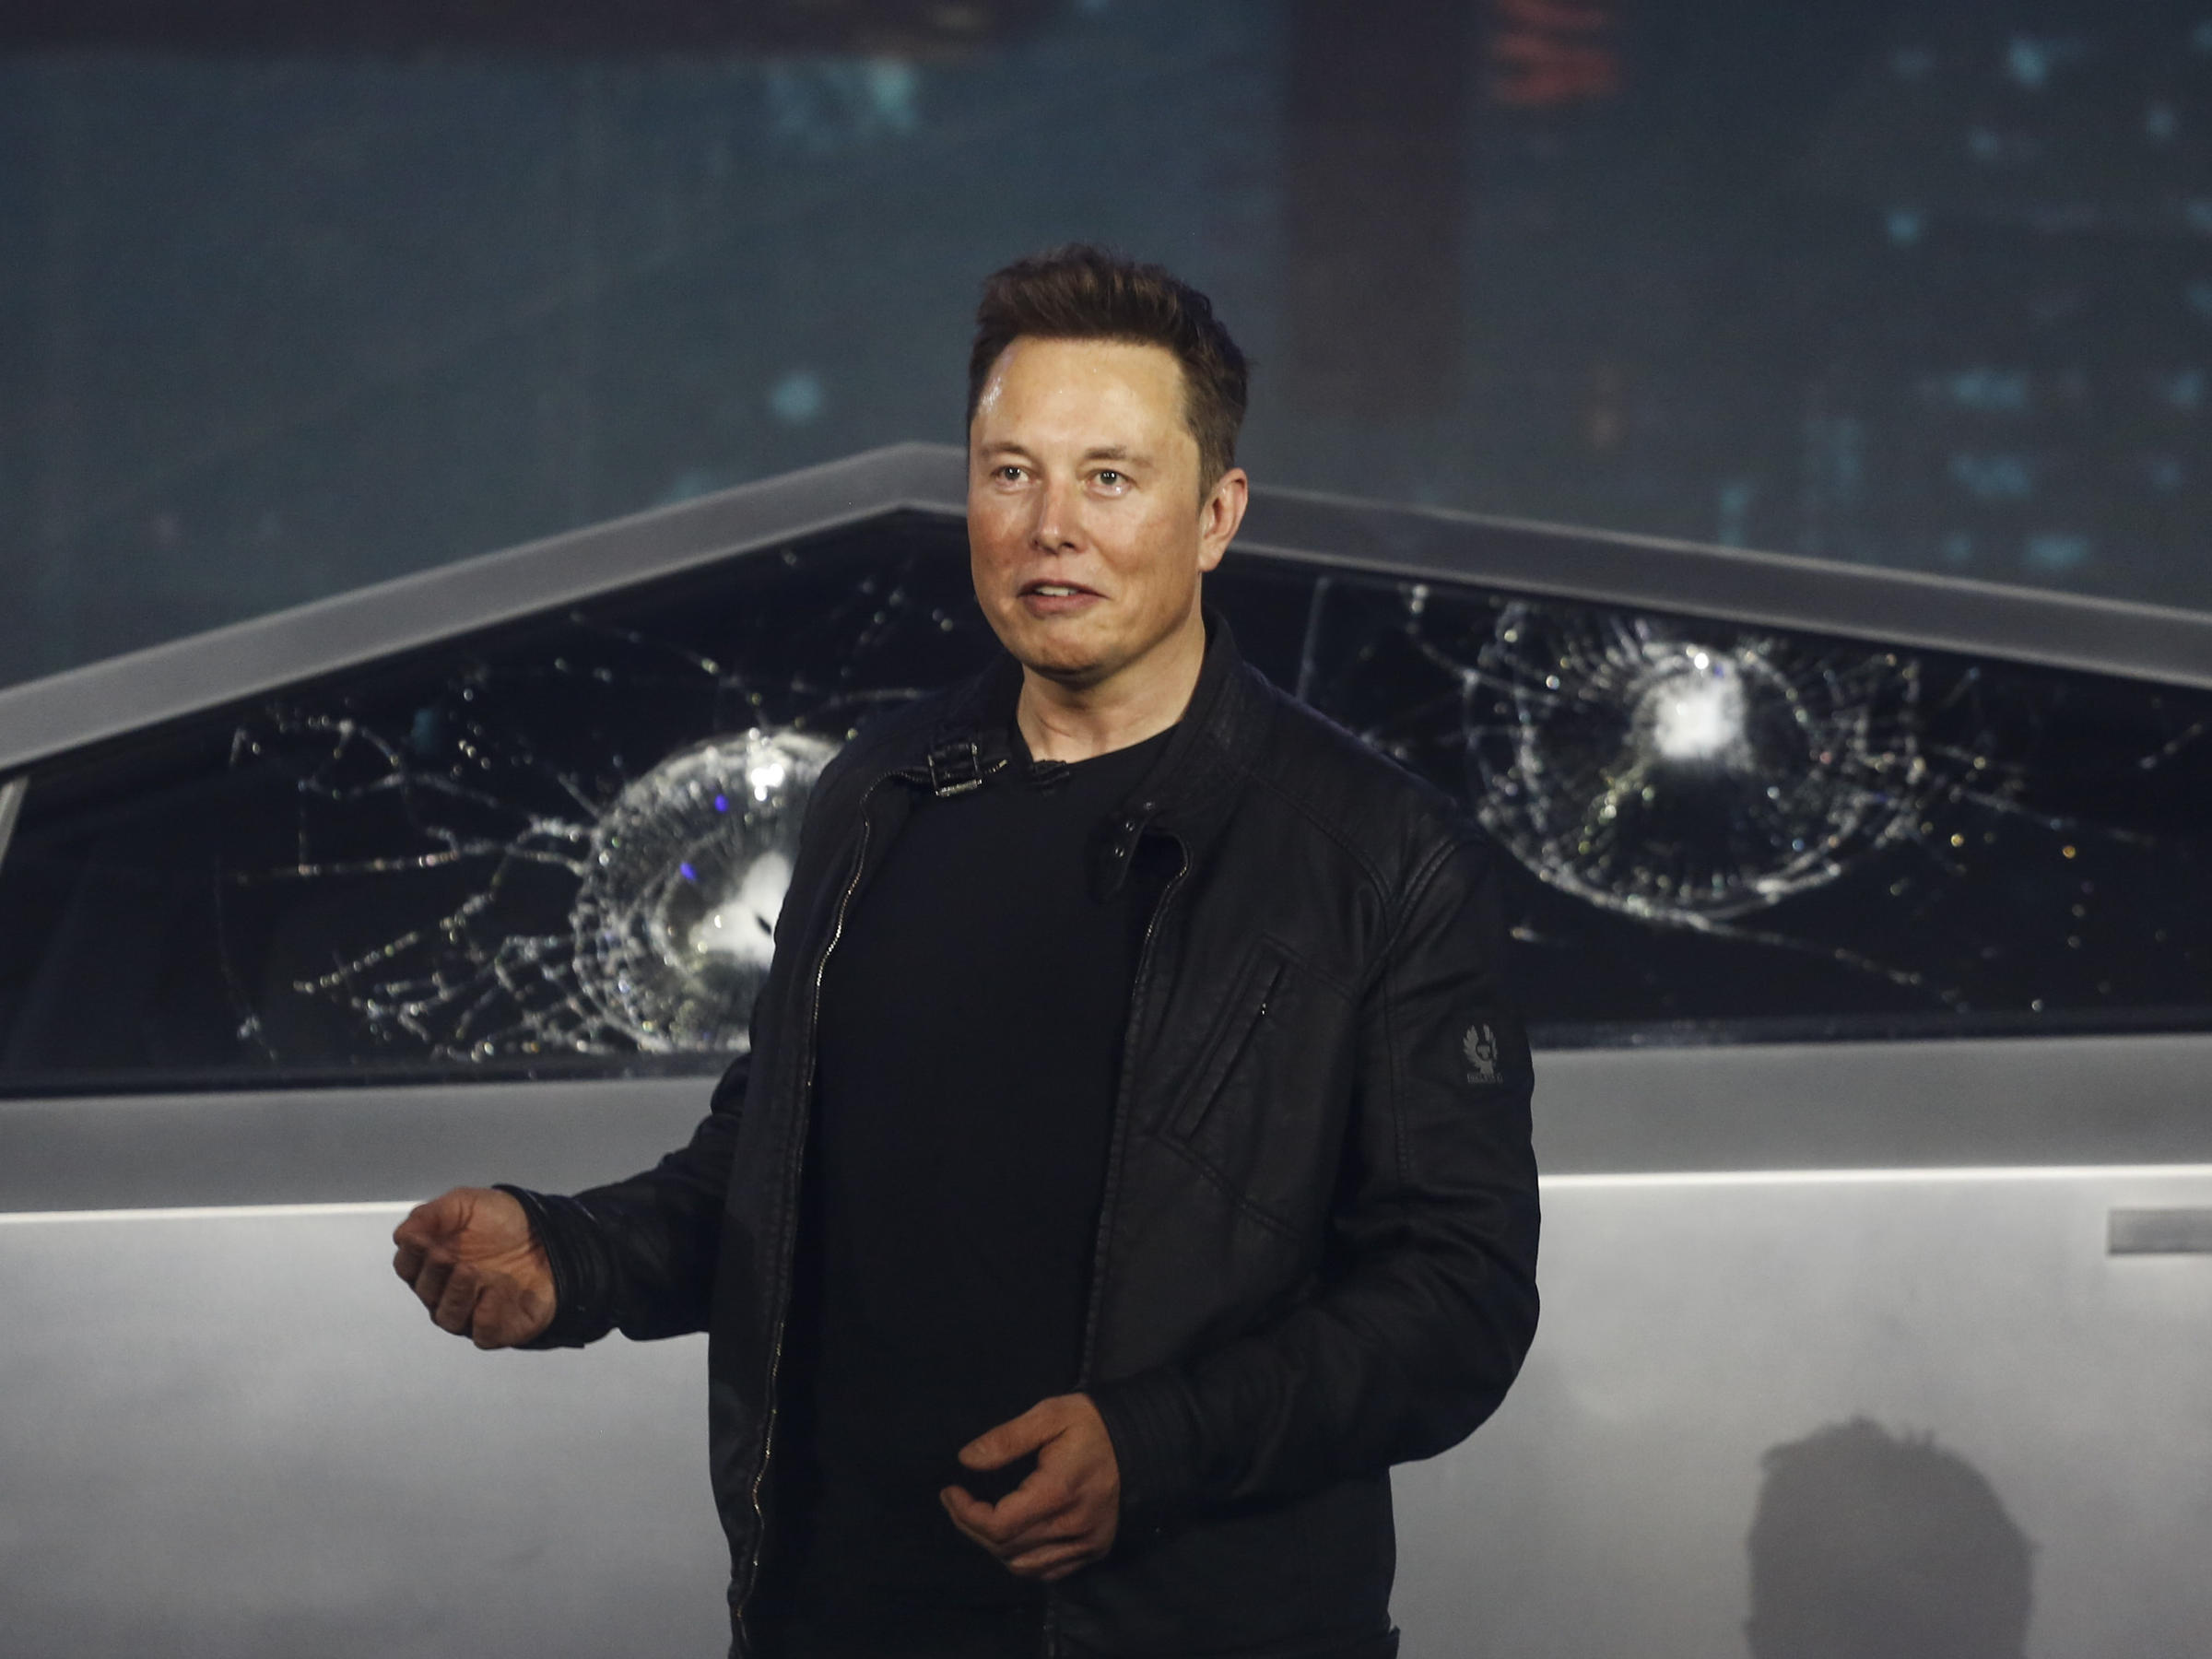 Elon Musk Unveils Tesla S Cybertruck With A Polarizing Wedge Shape Wypr